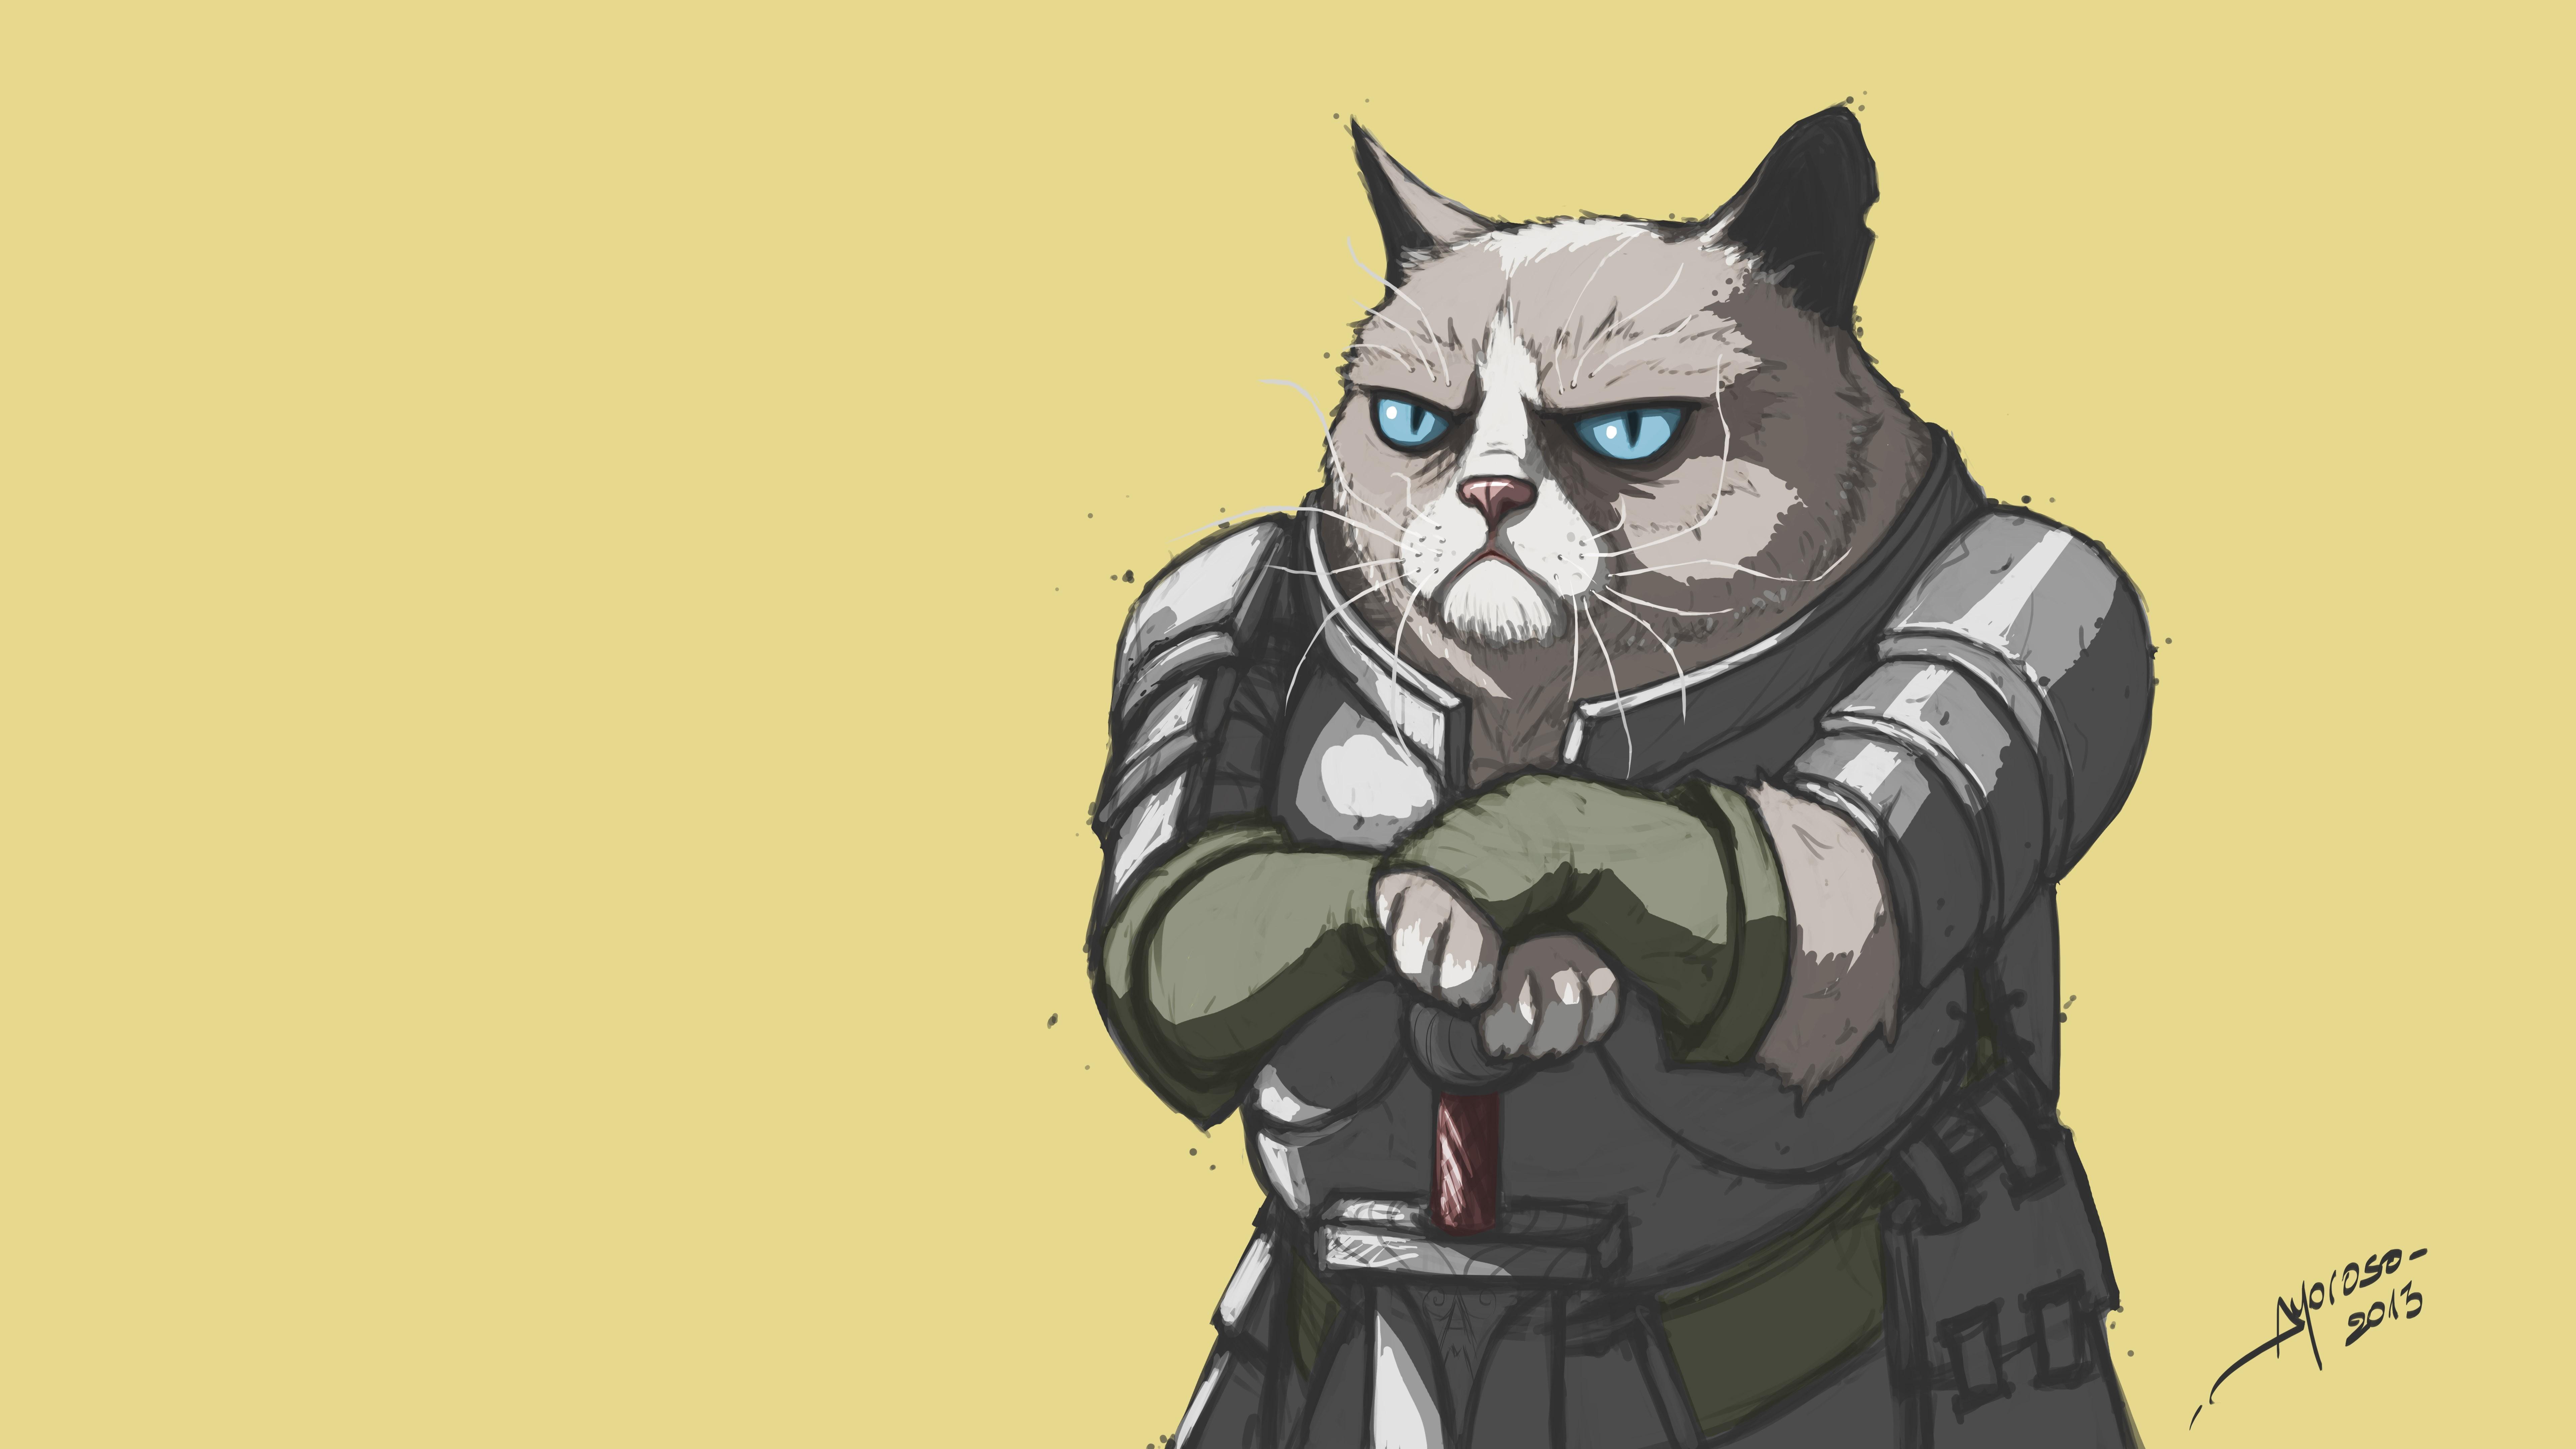 Wallpaper Ilustrasi Gambar Kartun Kucing Pemarah Ned